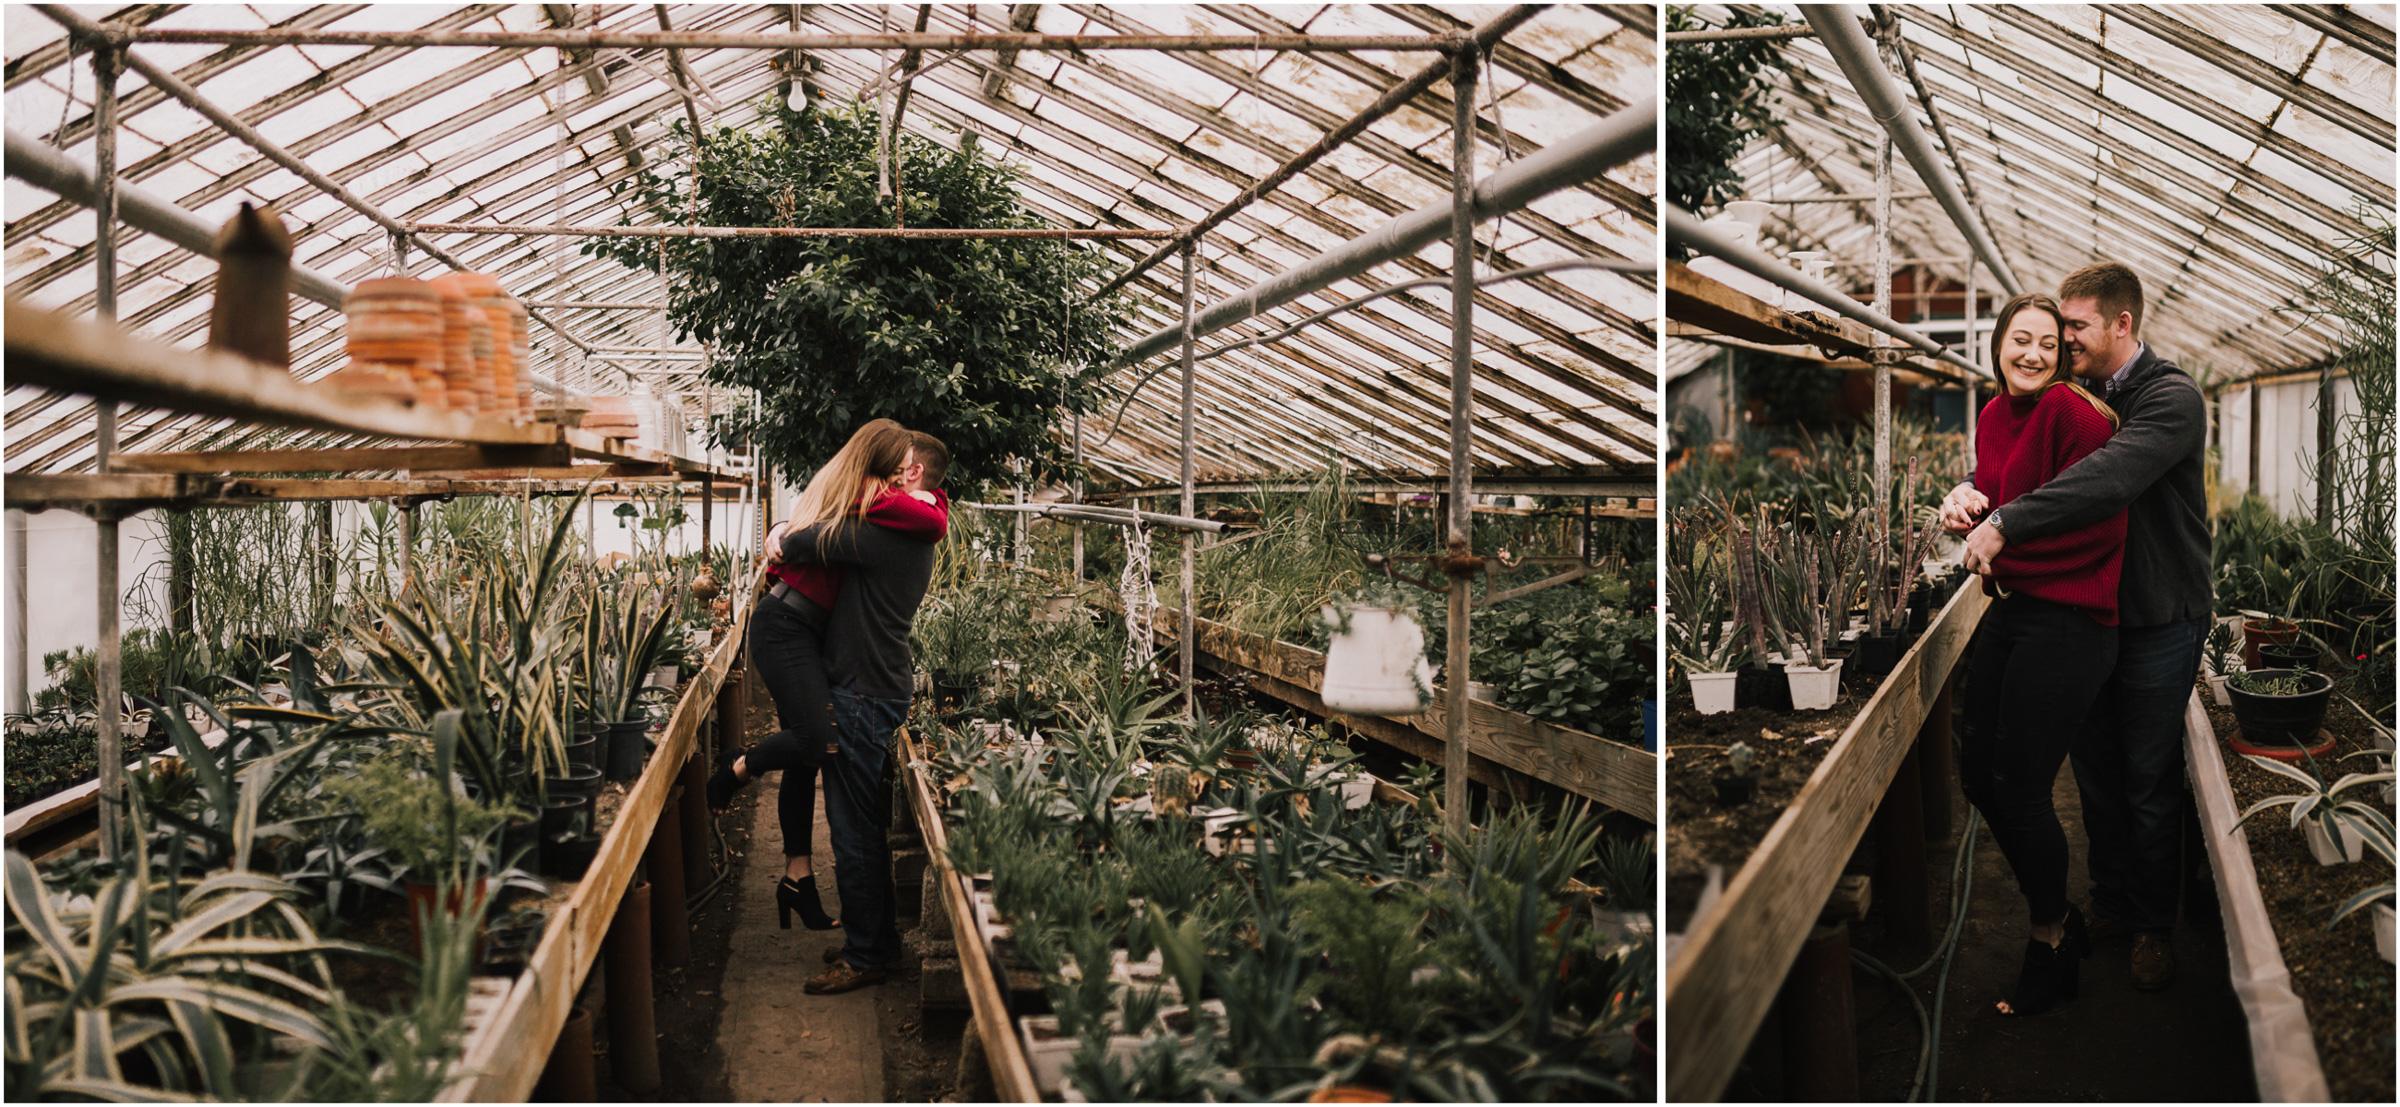 alyssa barletter photography johns greenhouse kansas city missouri brookside waldo engagement session winter-5.jpg